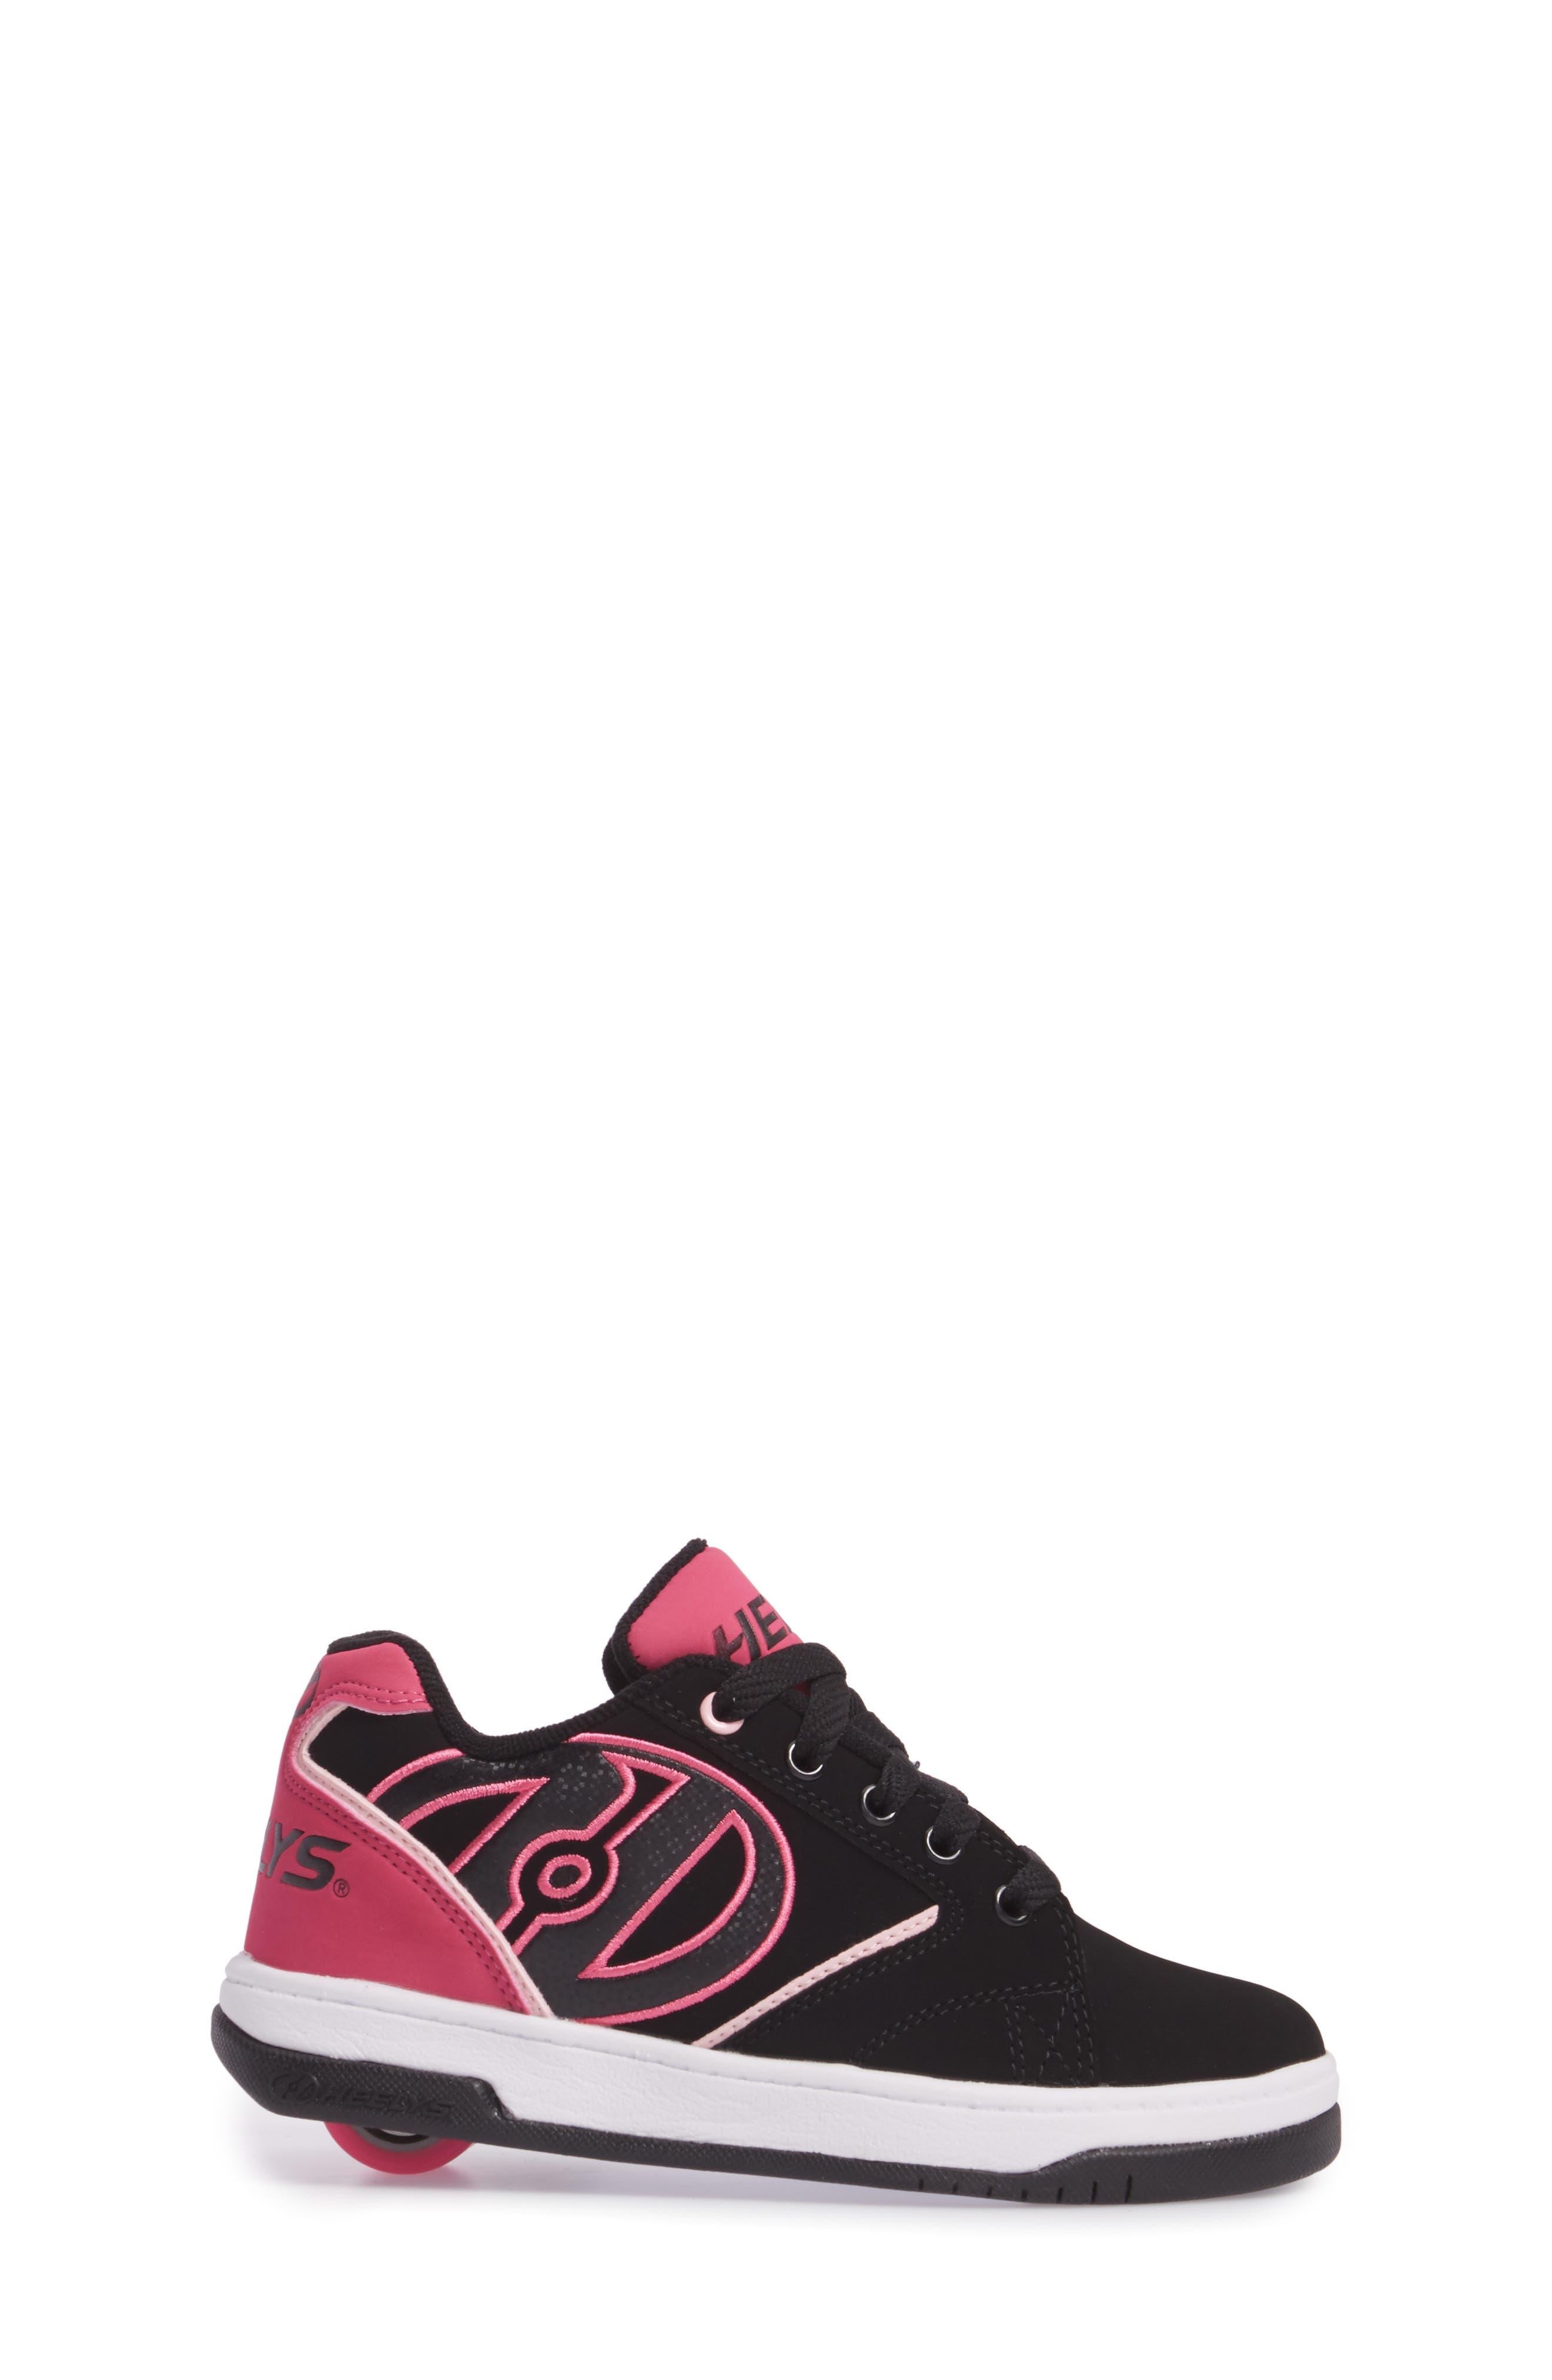 Propel 2.0 Sneaker,                             Alternate thumbnail 3, color,                             BLACK/ PINK/ WHITE